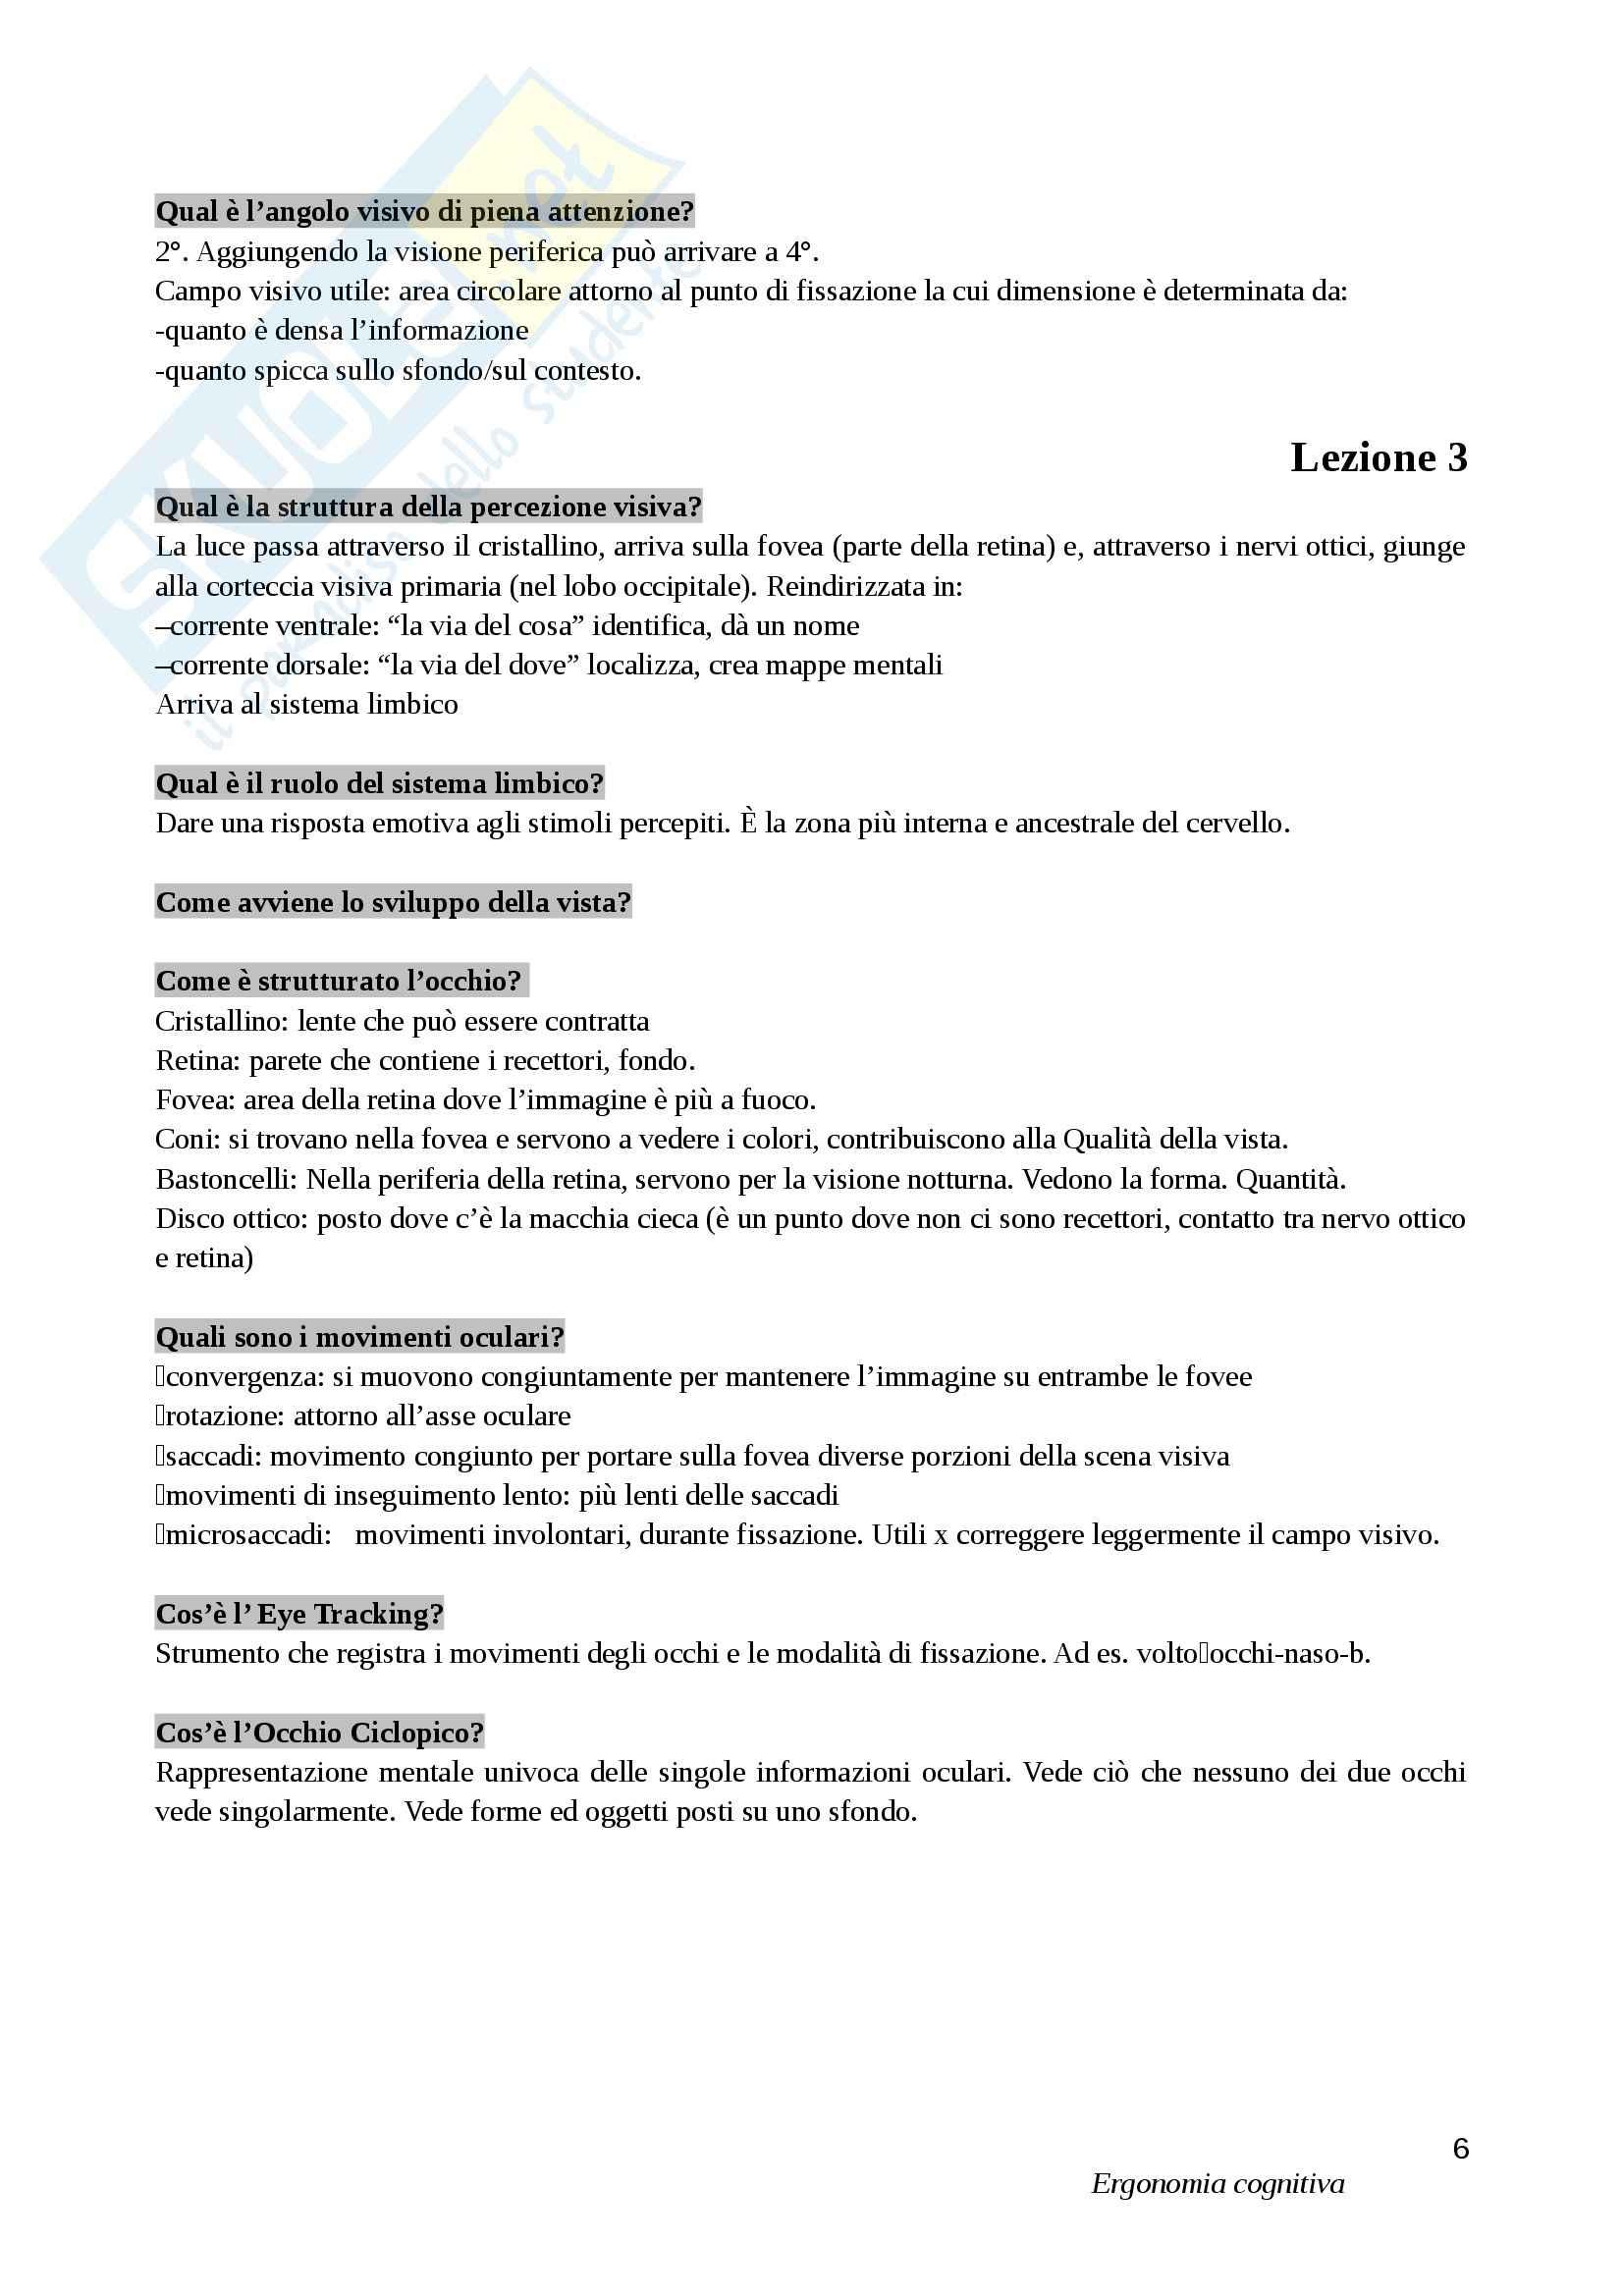 Lezioni, Ergonomia cognitiva Pag. 6